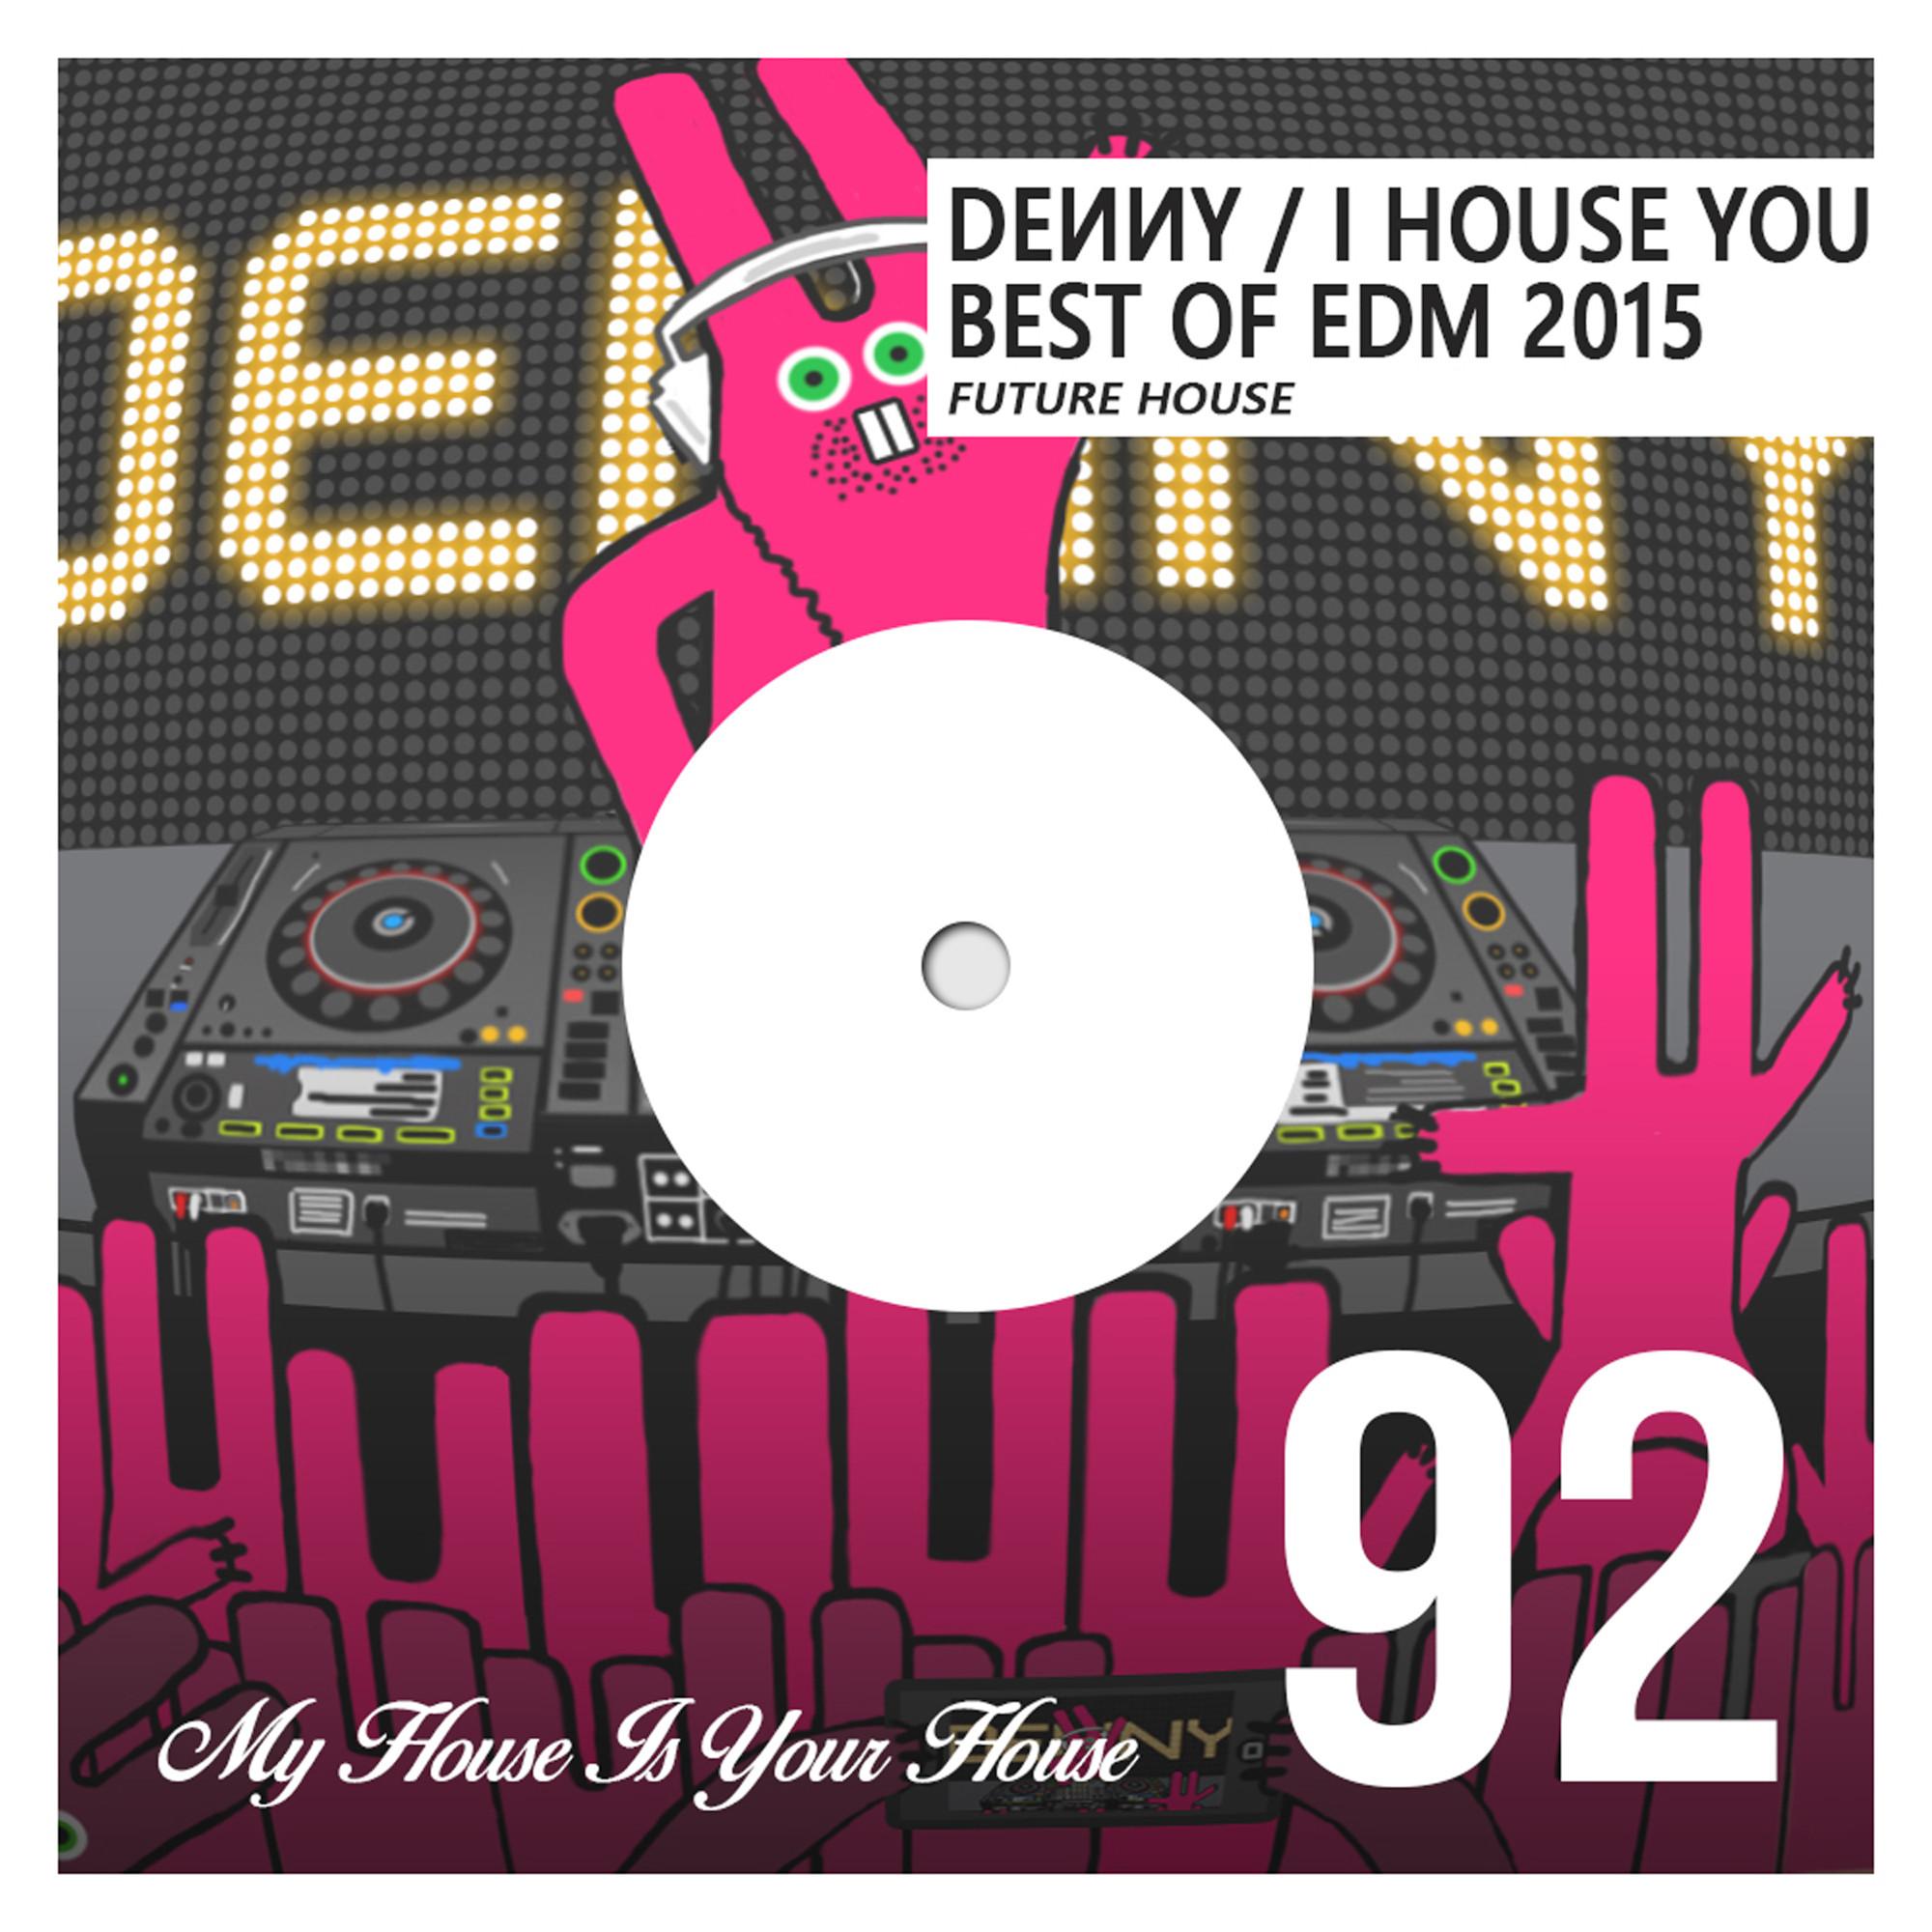 Denny - I House You 92 - Best Of EDM 2015 - Future House